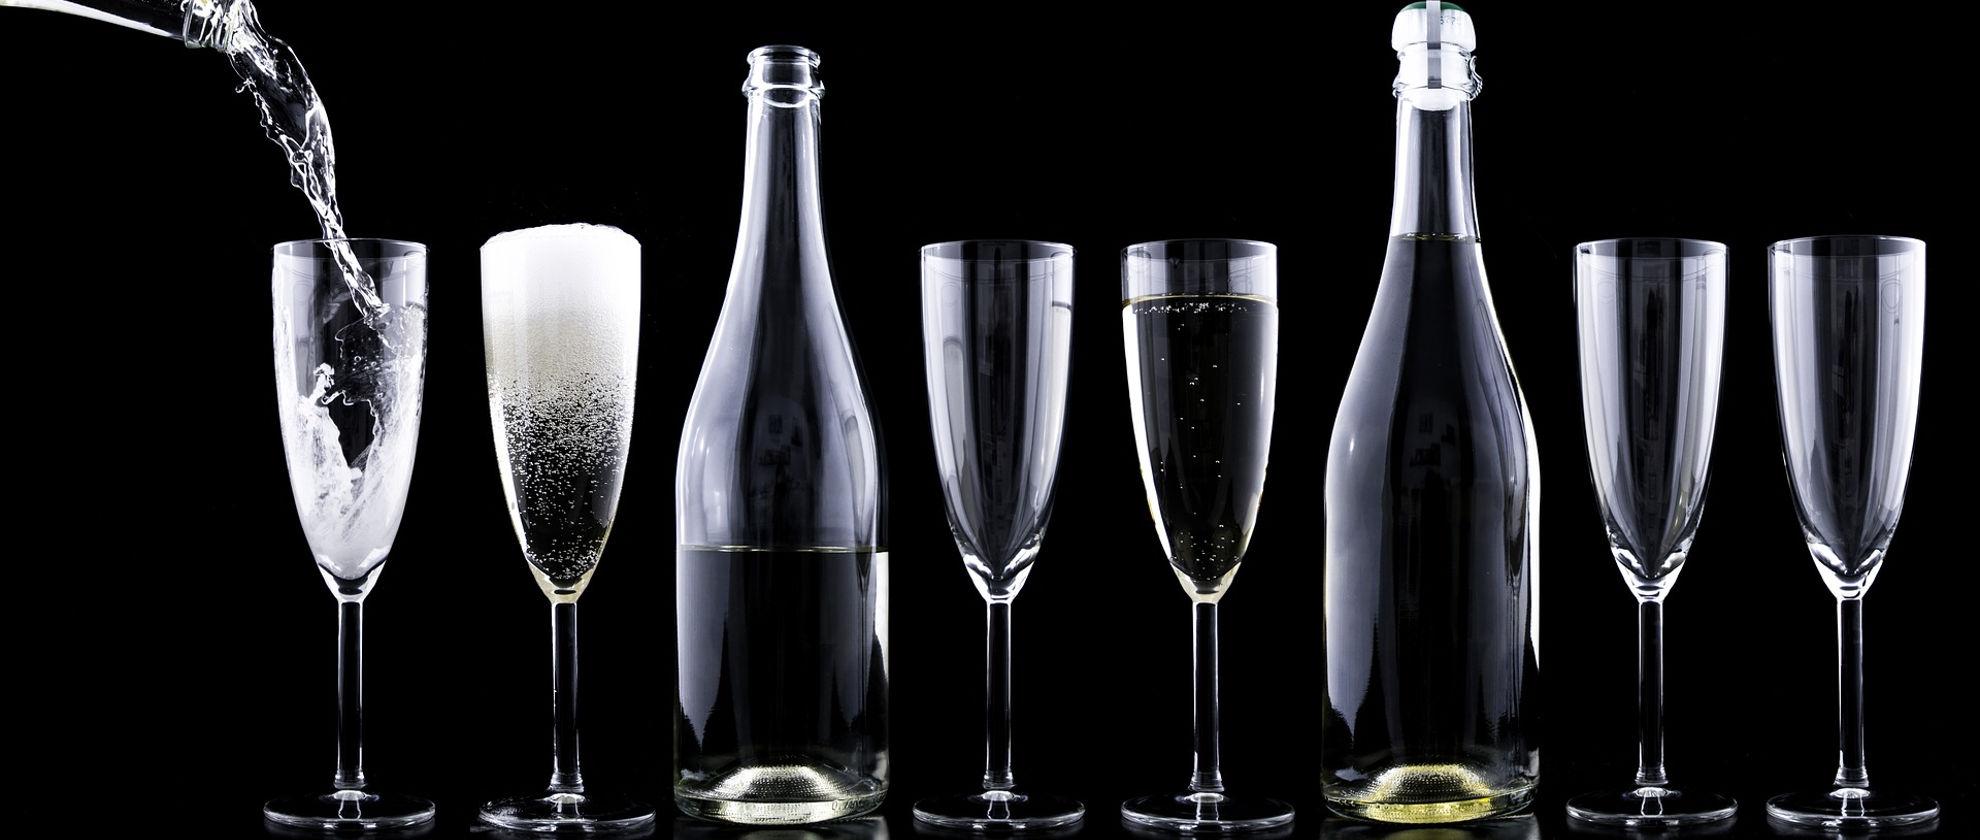 Festive Fizz: Prosecco Based Cocktails